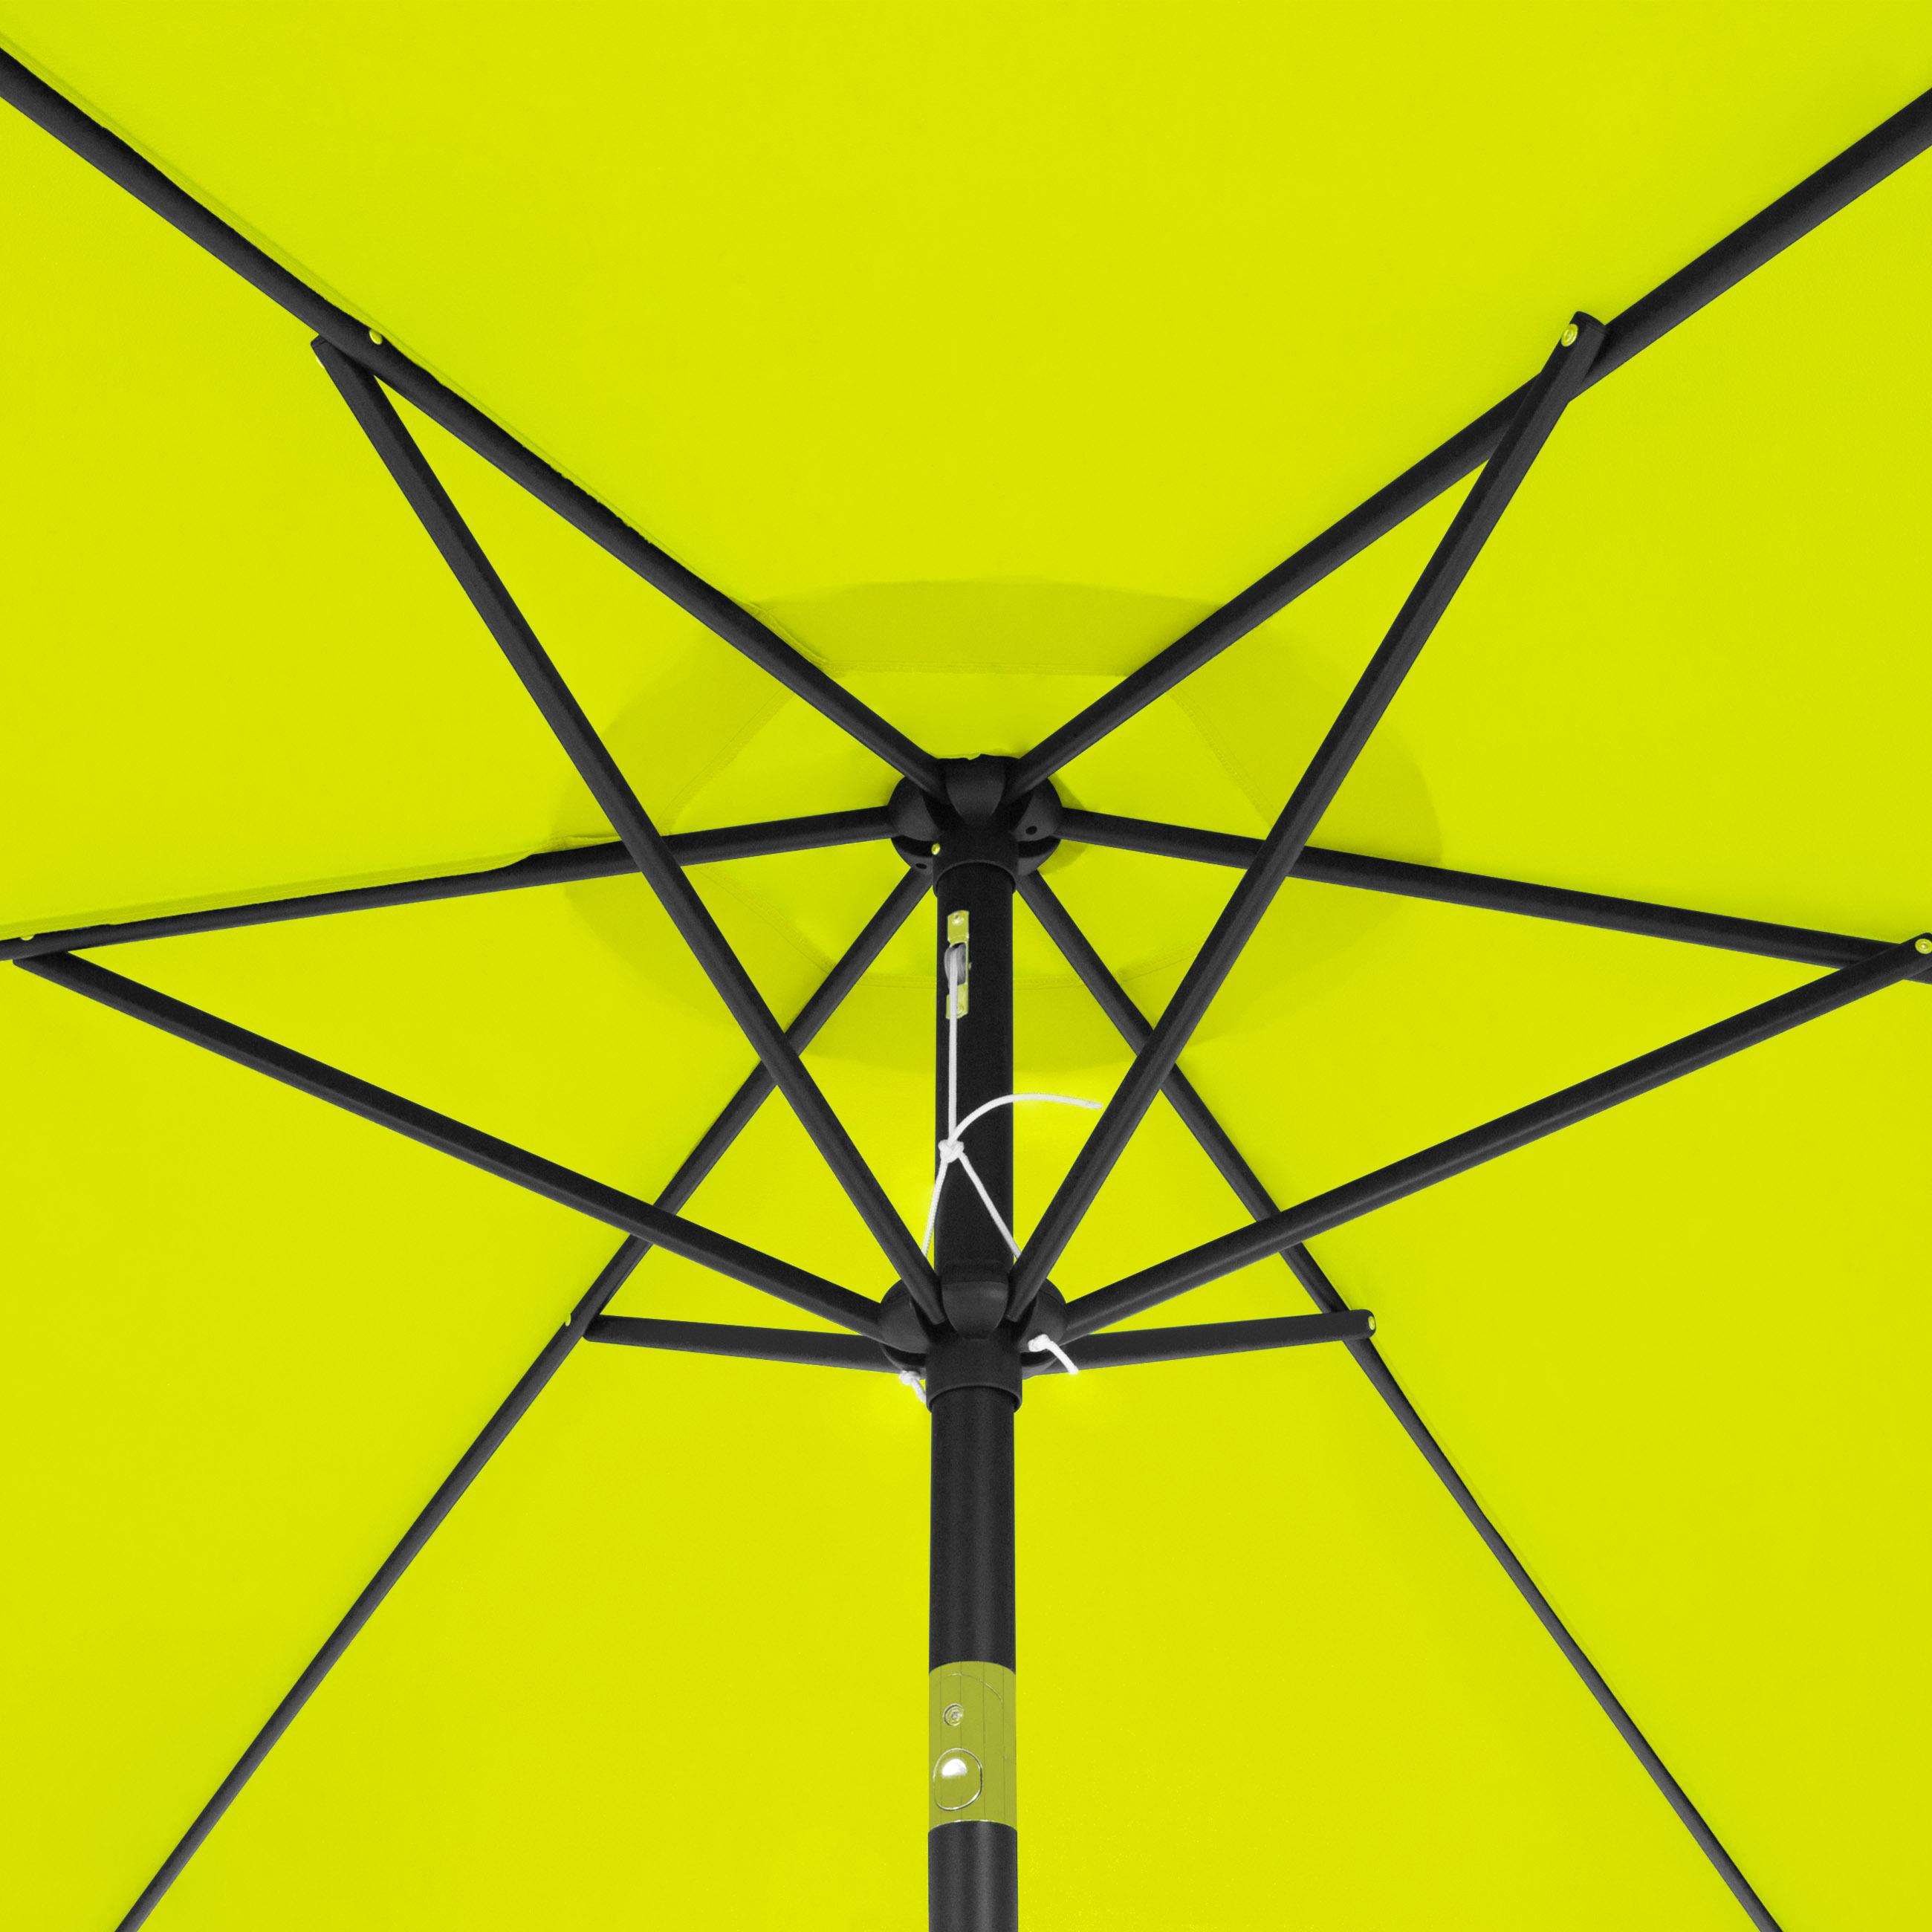 BCP-10ft-Outdoor-Steel-Market-Patio-Umbrella-Decoration-w-Tilt-Crank thumbnail 47